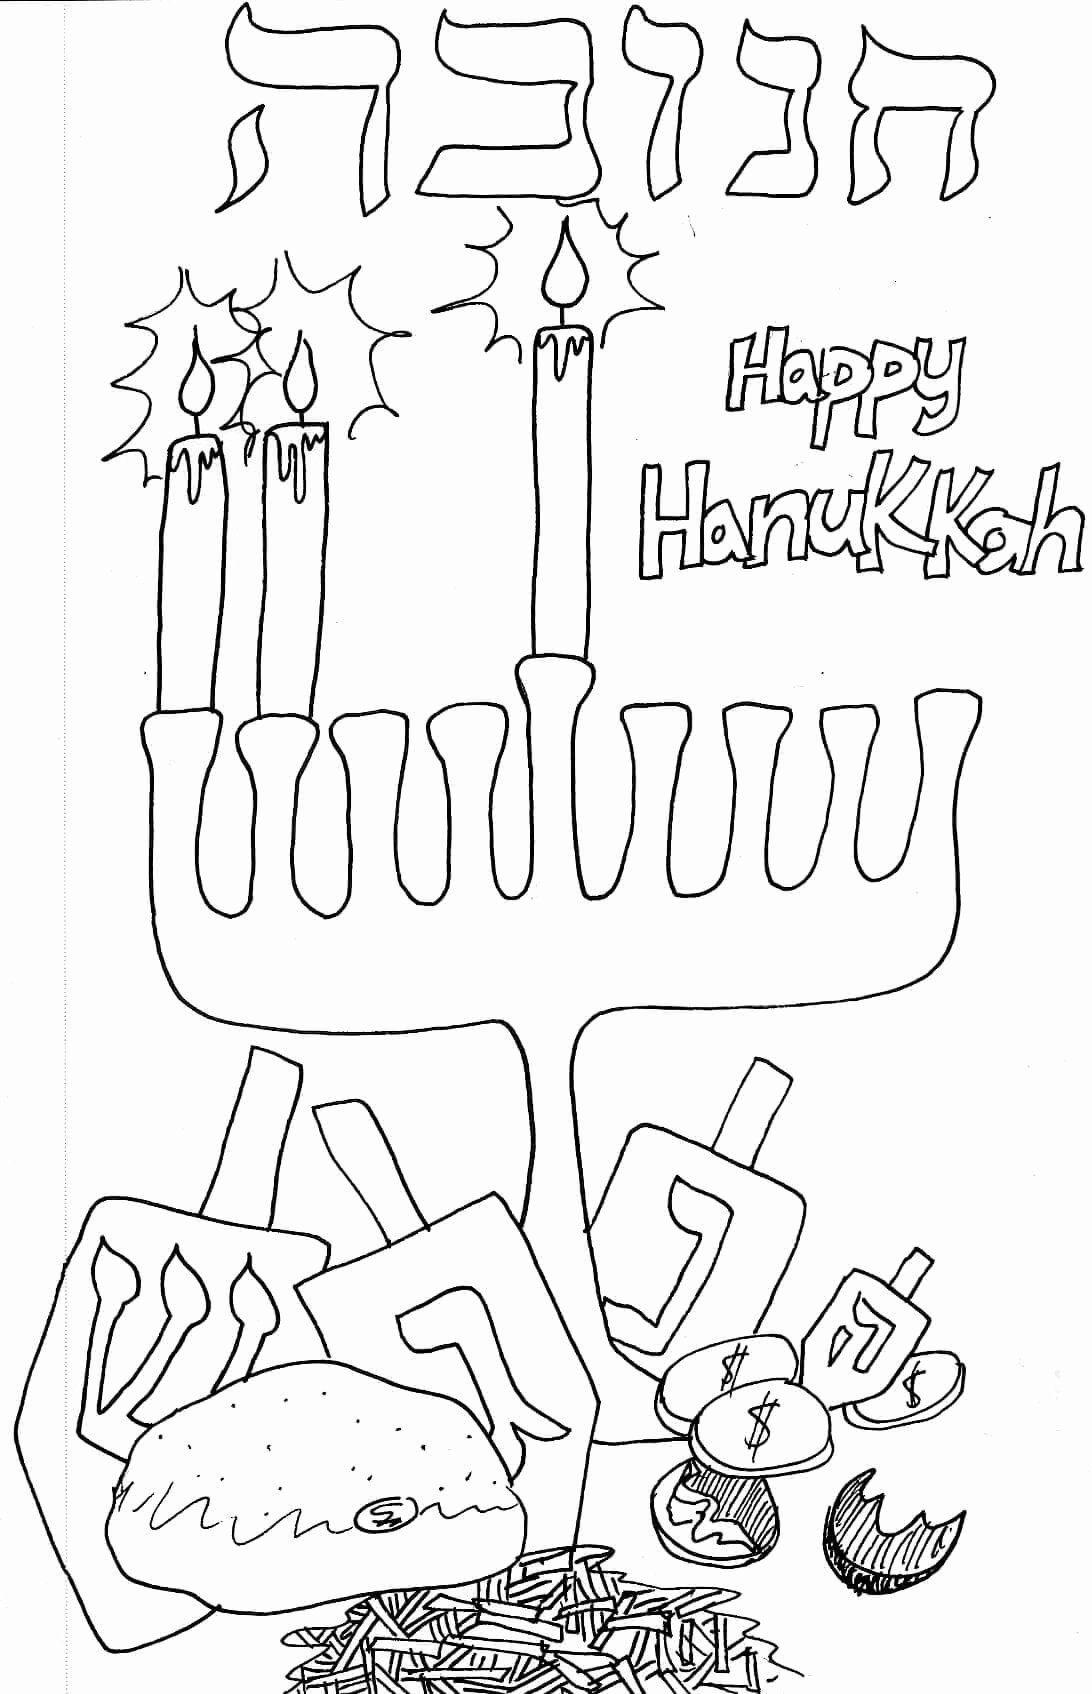 Printable Hanukkah Coloring Pages Beautiful 30 Free Hanukkah Coloring Pages Printable Menorah Hanukkah Drawing